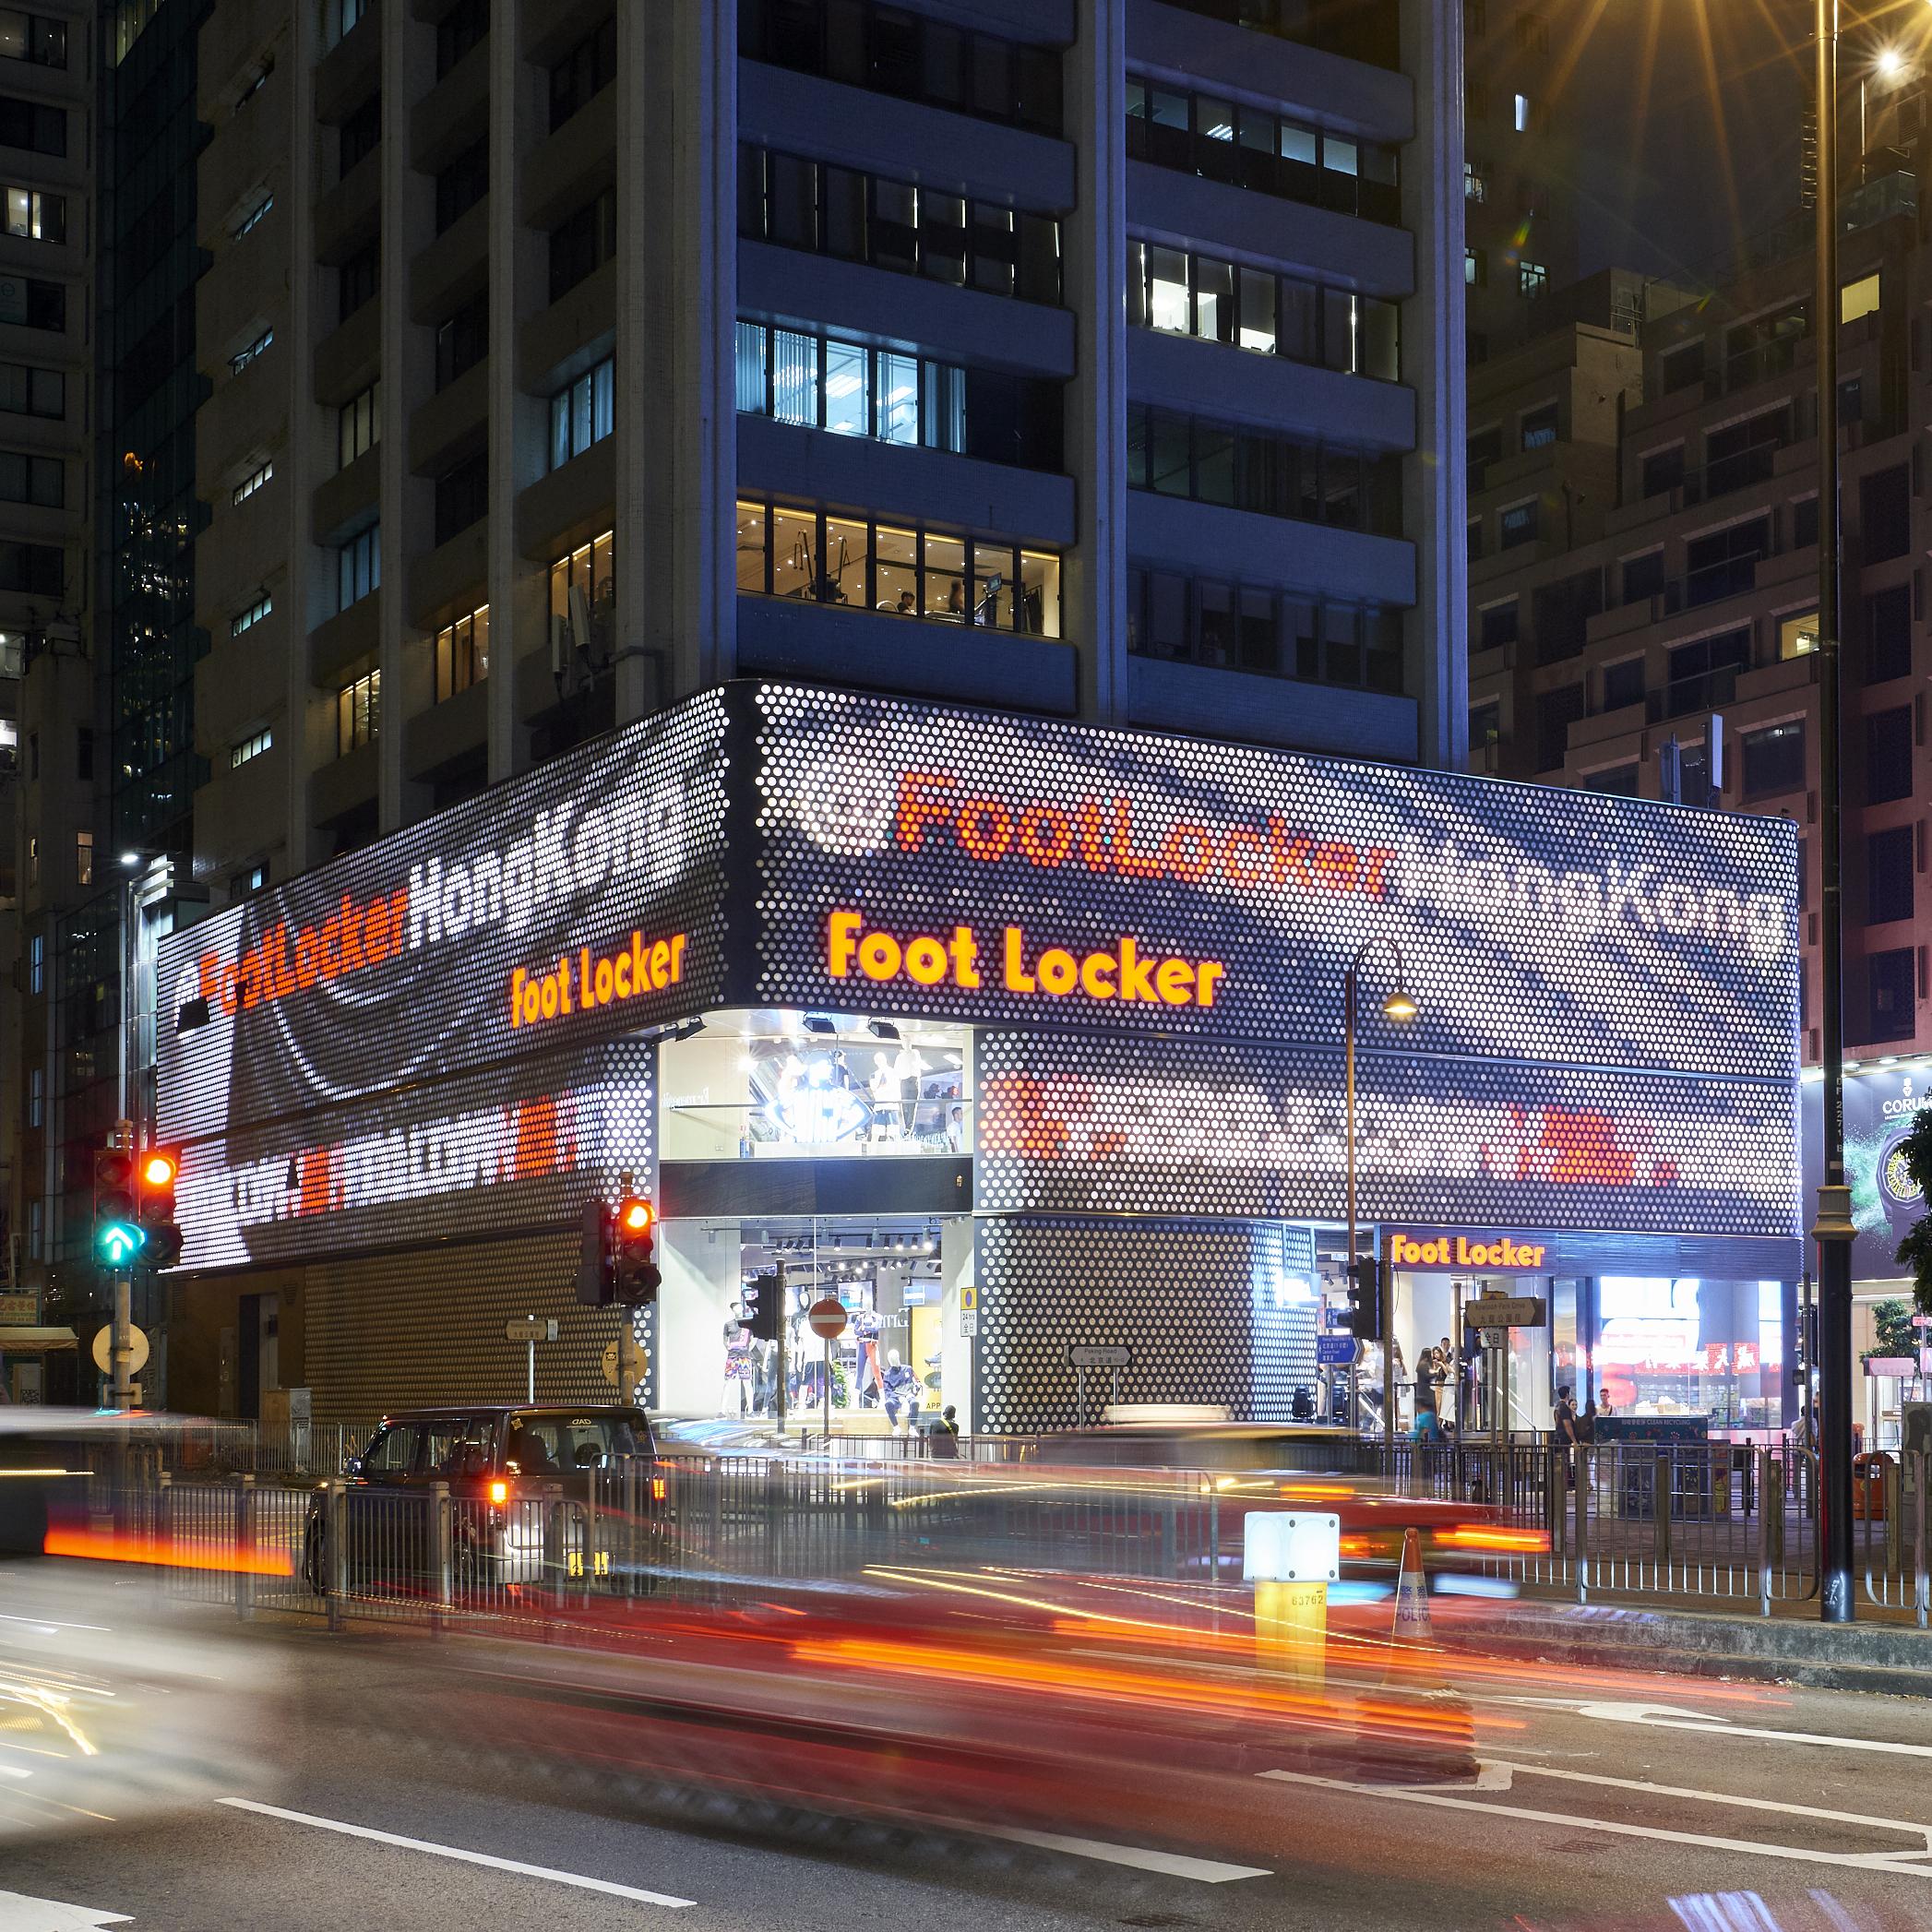 The new three-story Foot Locker Power Store in Tsim Sha Tsui_3.jpg